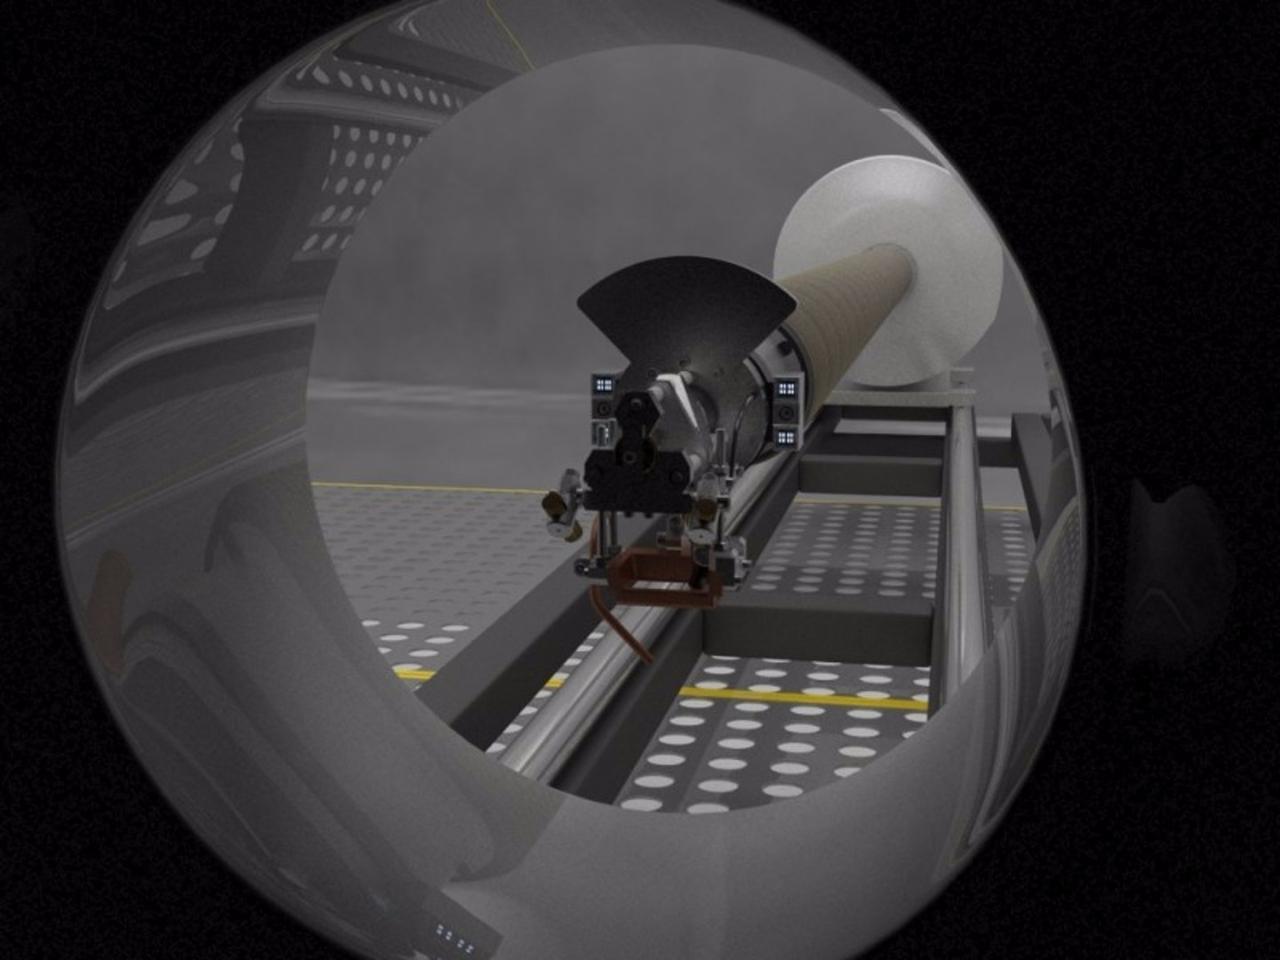 LaserPipe approaching work area